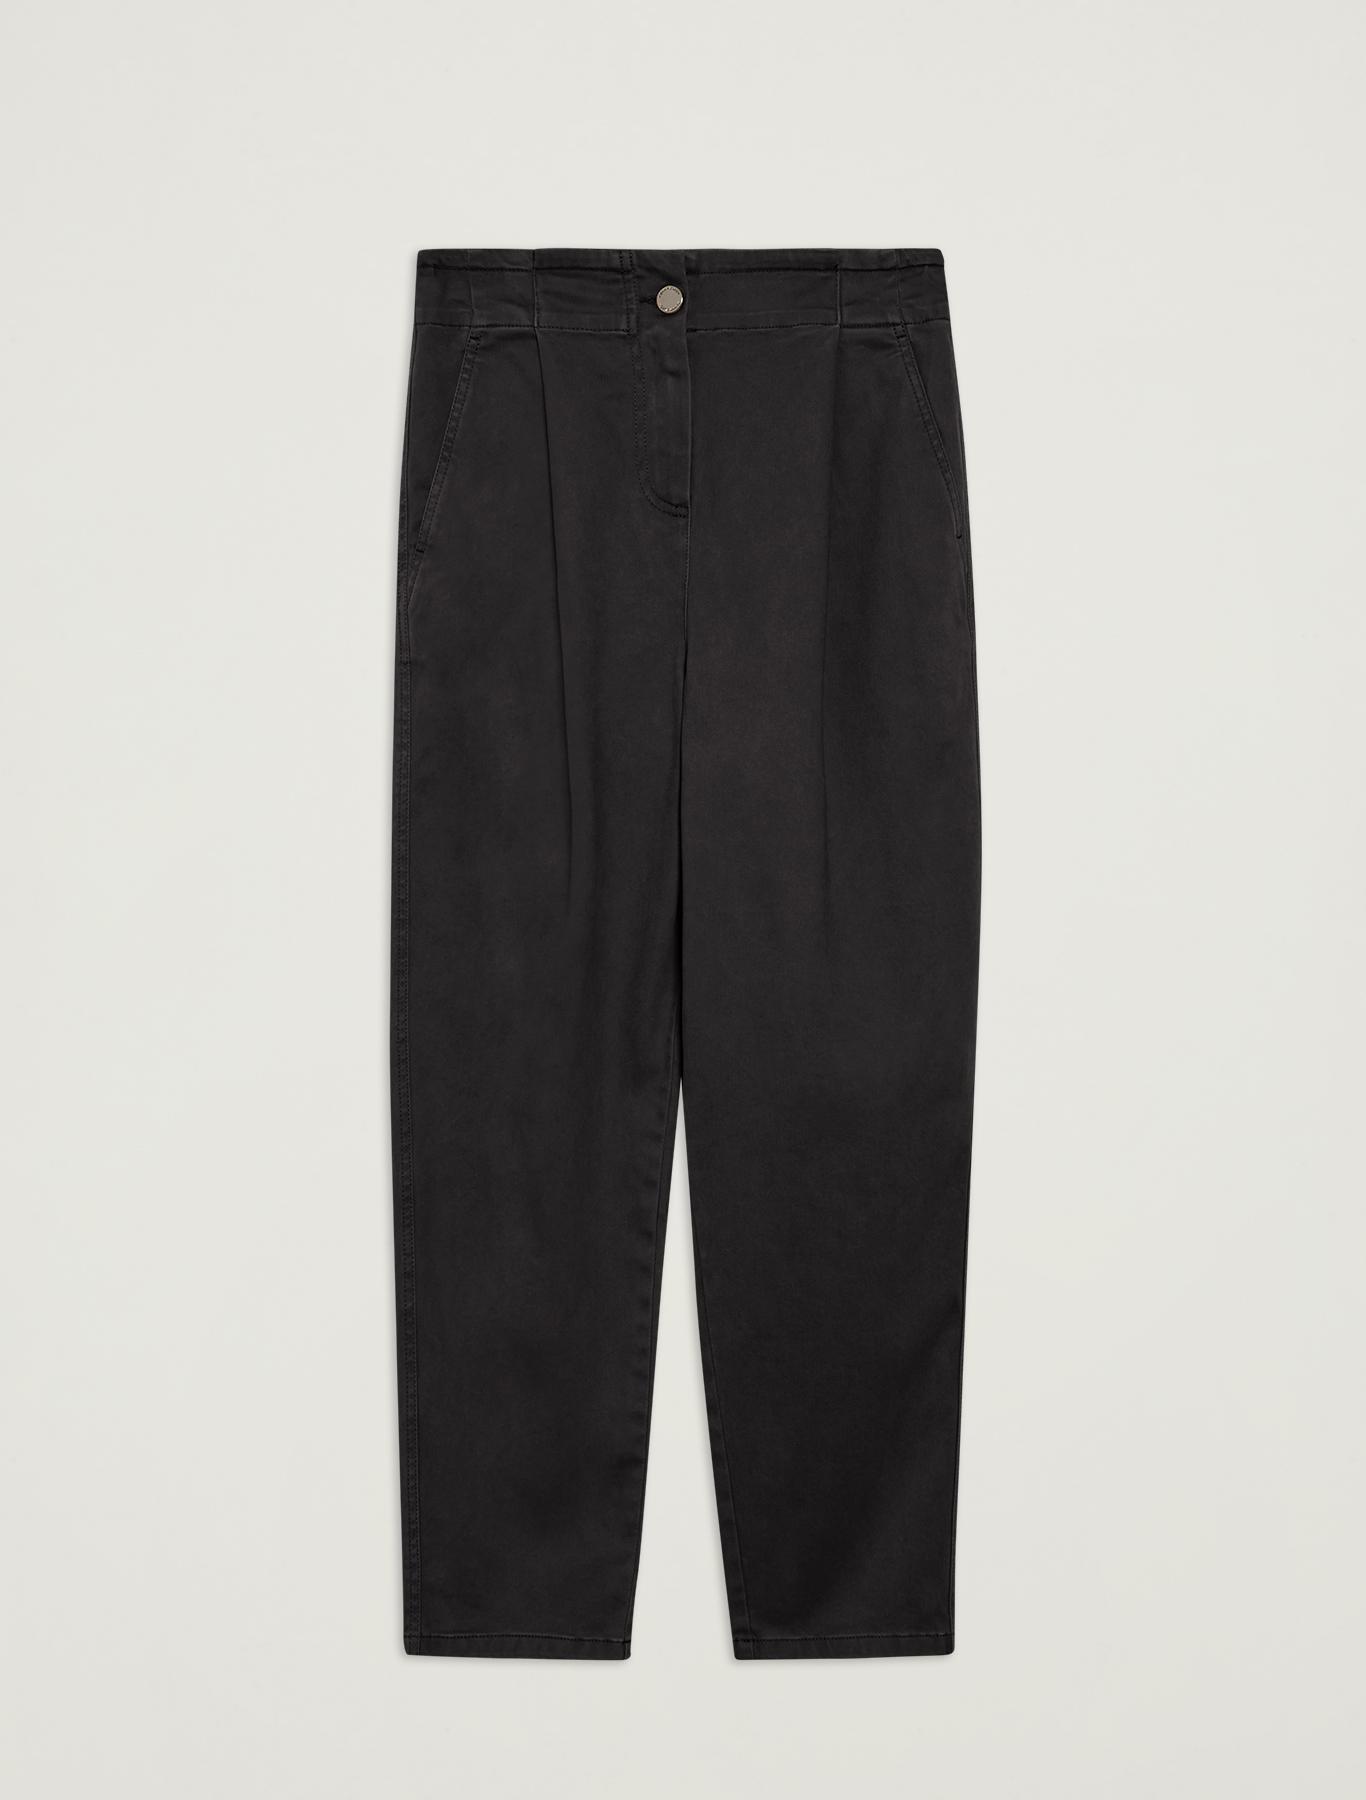 Cotton, carrot-fit trousers - black - pennyblack